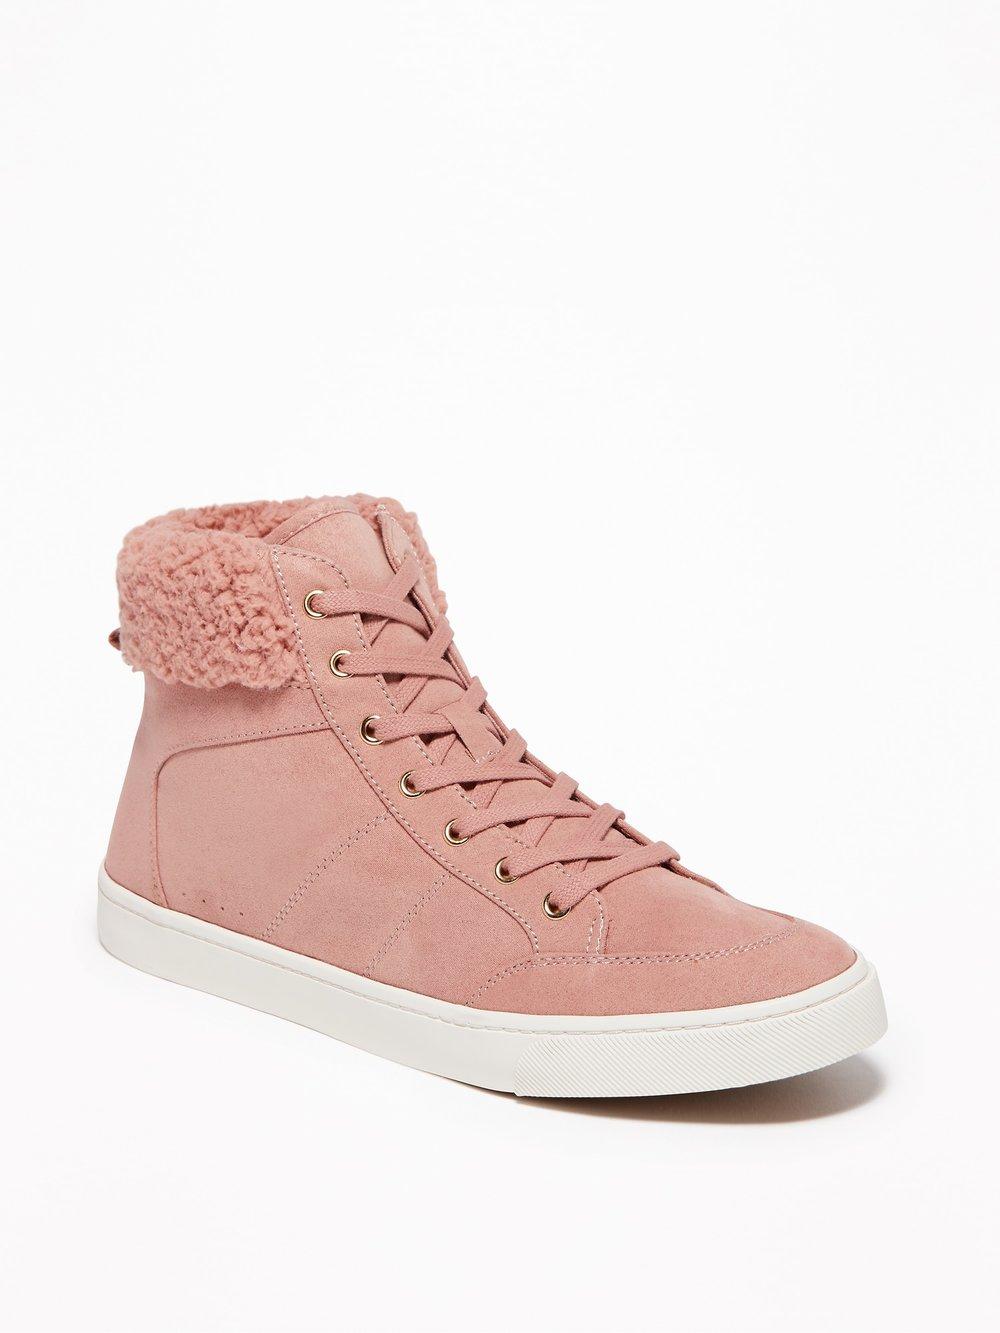 sherpa shoe.jpg